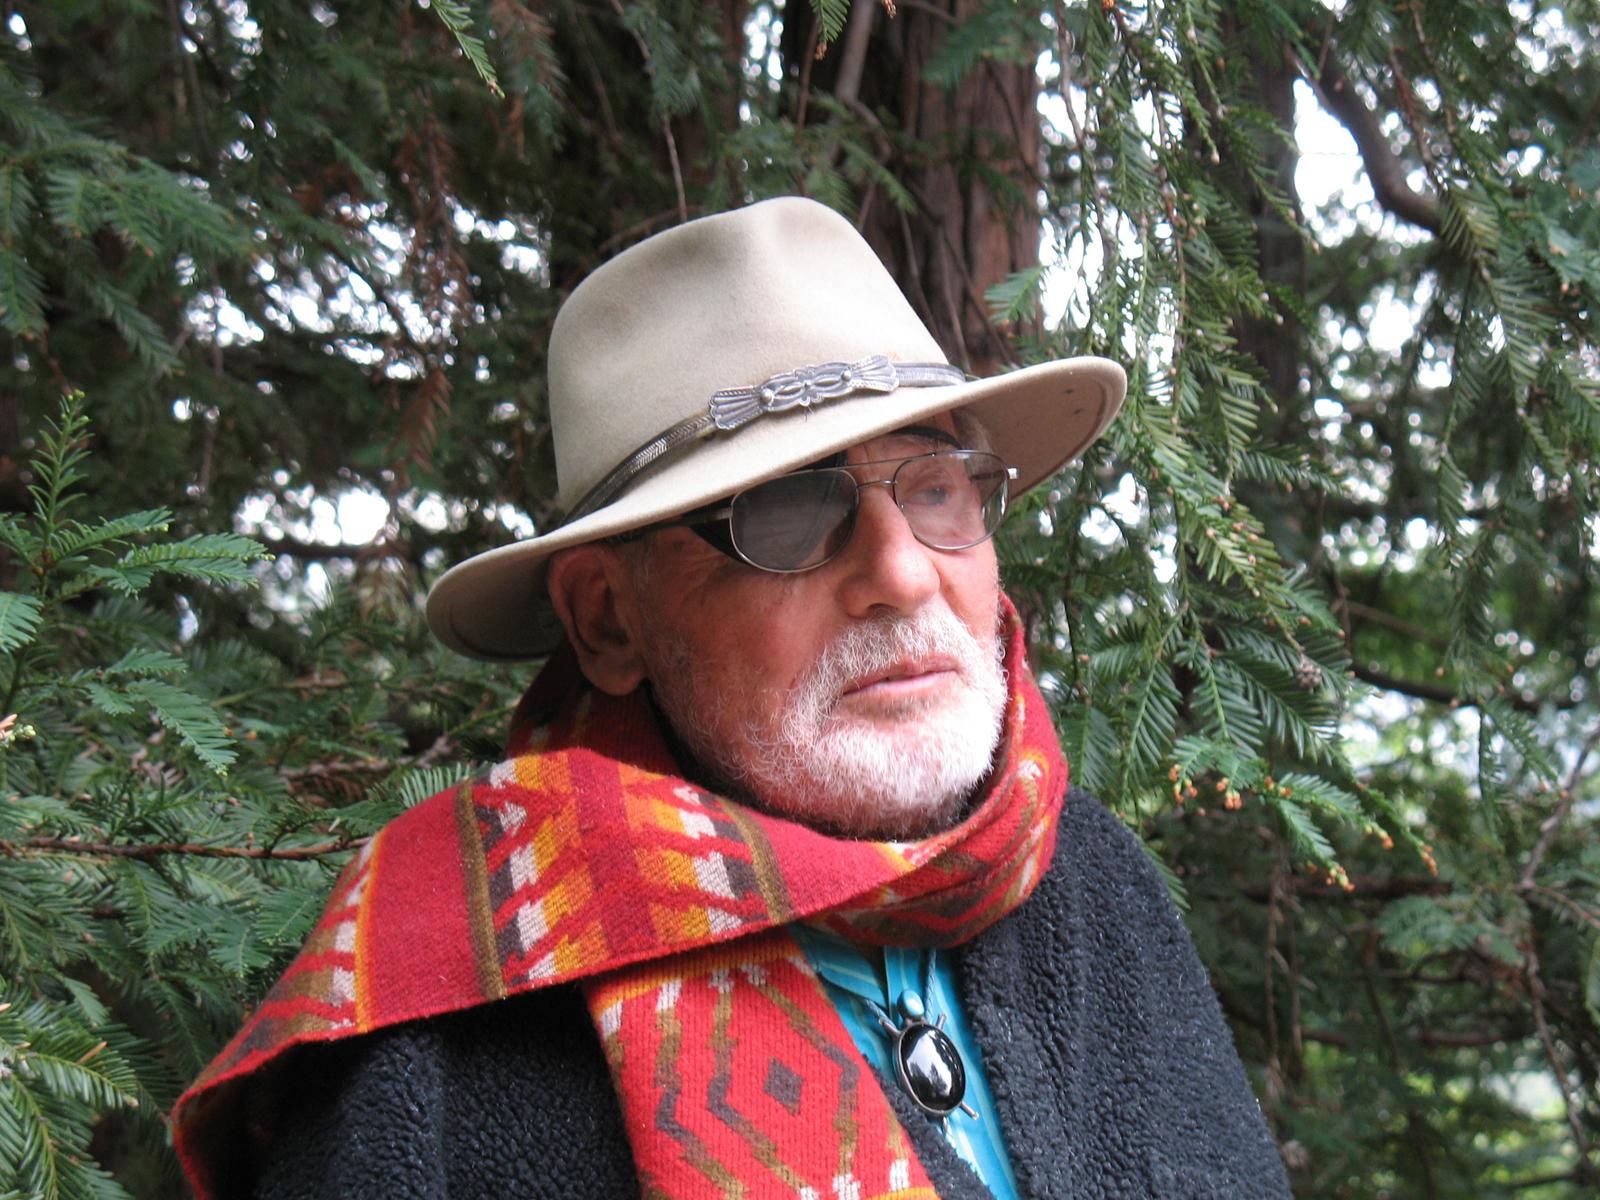 lawrence halprin portrait scarf